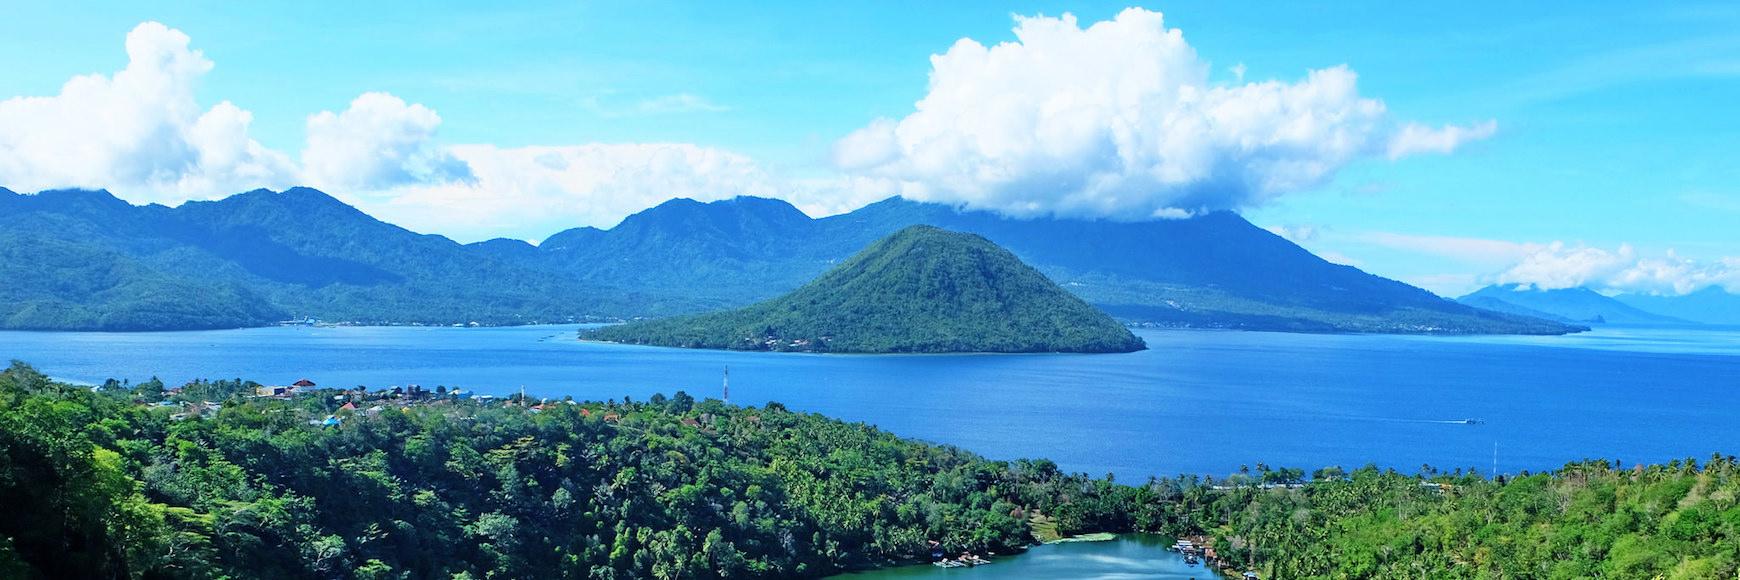 noleggio barca a motore Indonesia